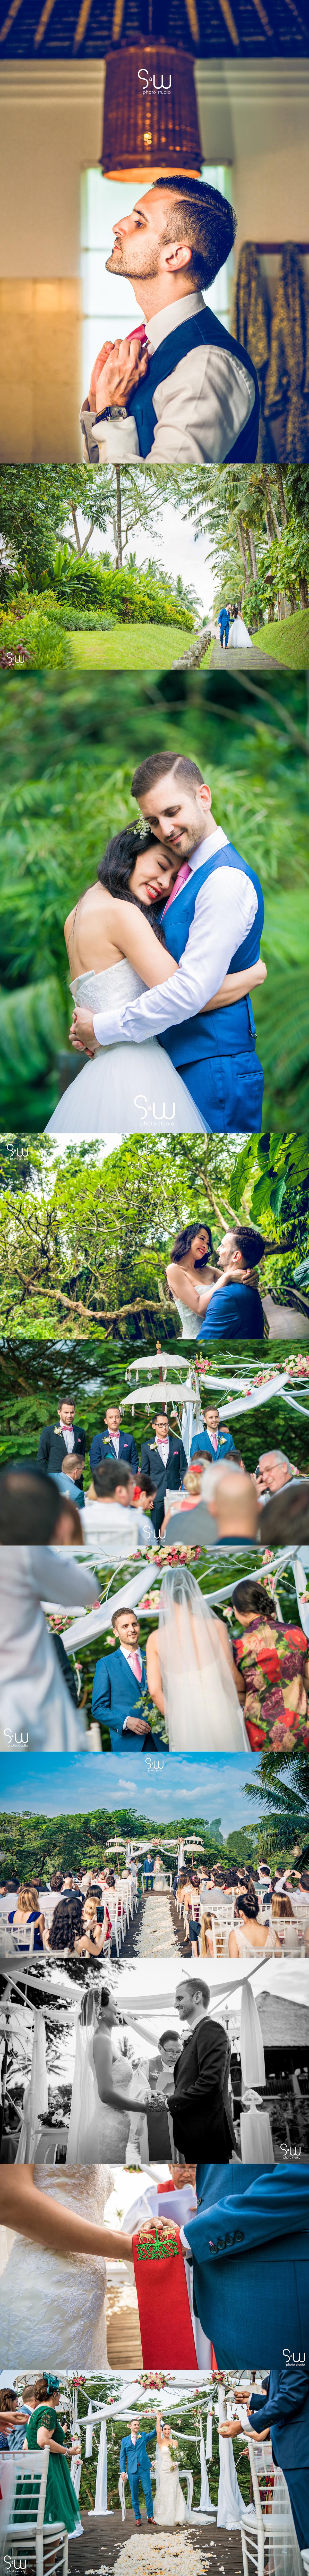 WEDDING |  Maya Ubud , Bali( 峇里島婚禮) | sw photo studio 婚禮, 婚攝, 婚紗, 海外婚禮, 海外婚紗, 海島婚禮,峇里島婚禮, 峇里島婚紗, 台灣婚禮, 婚攝推薦